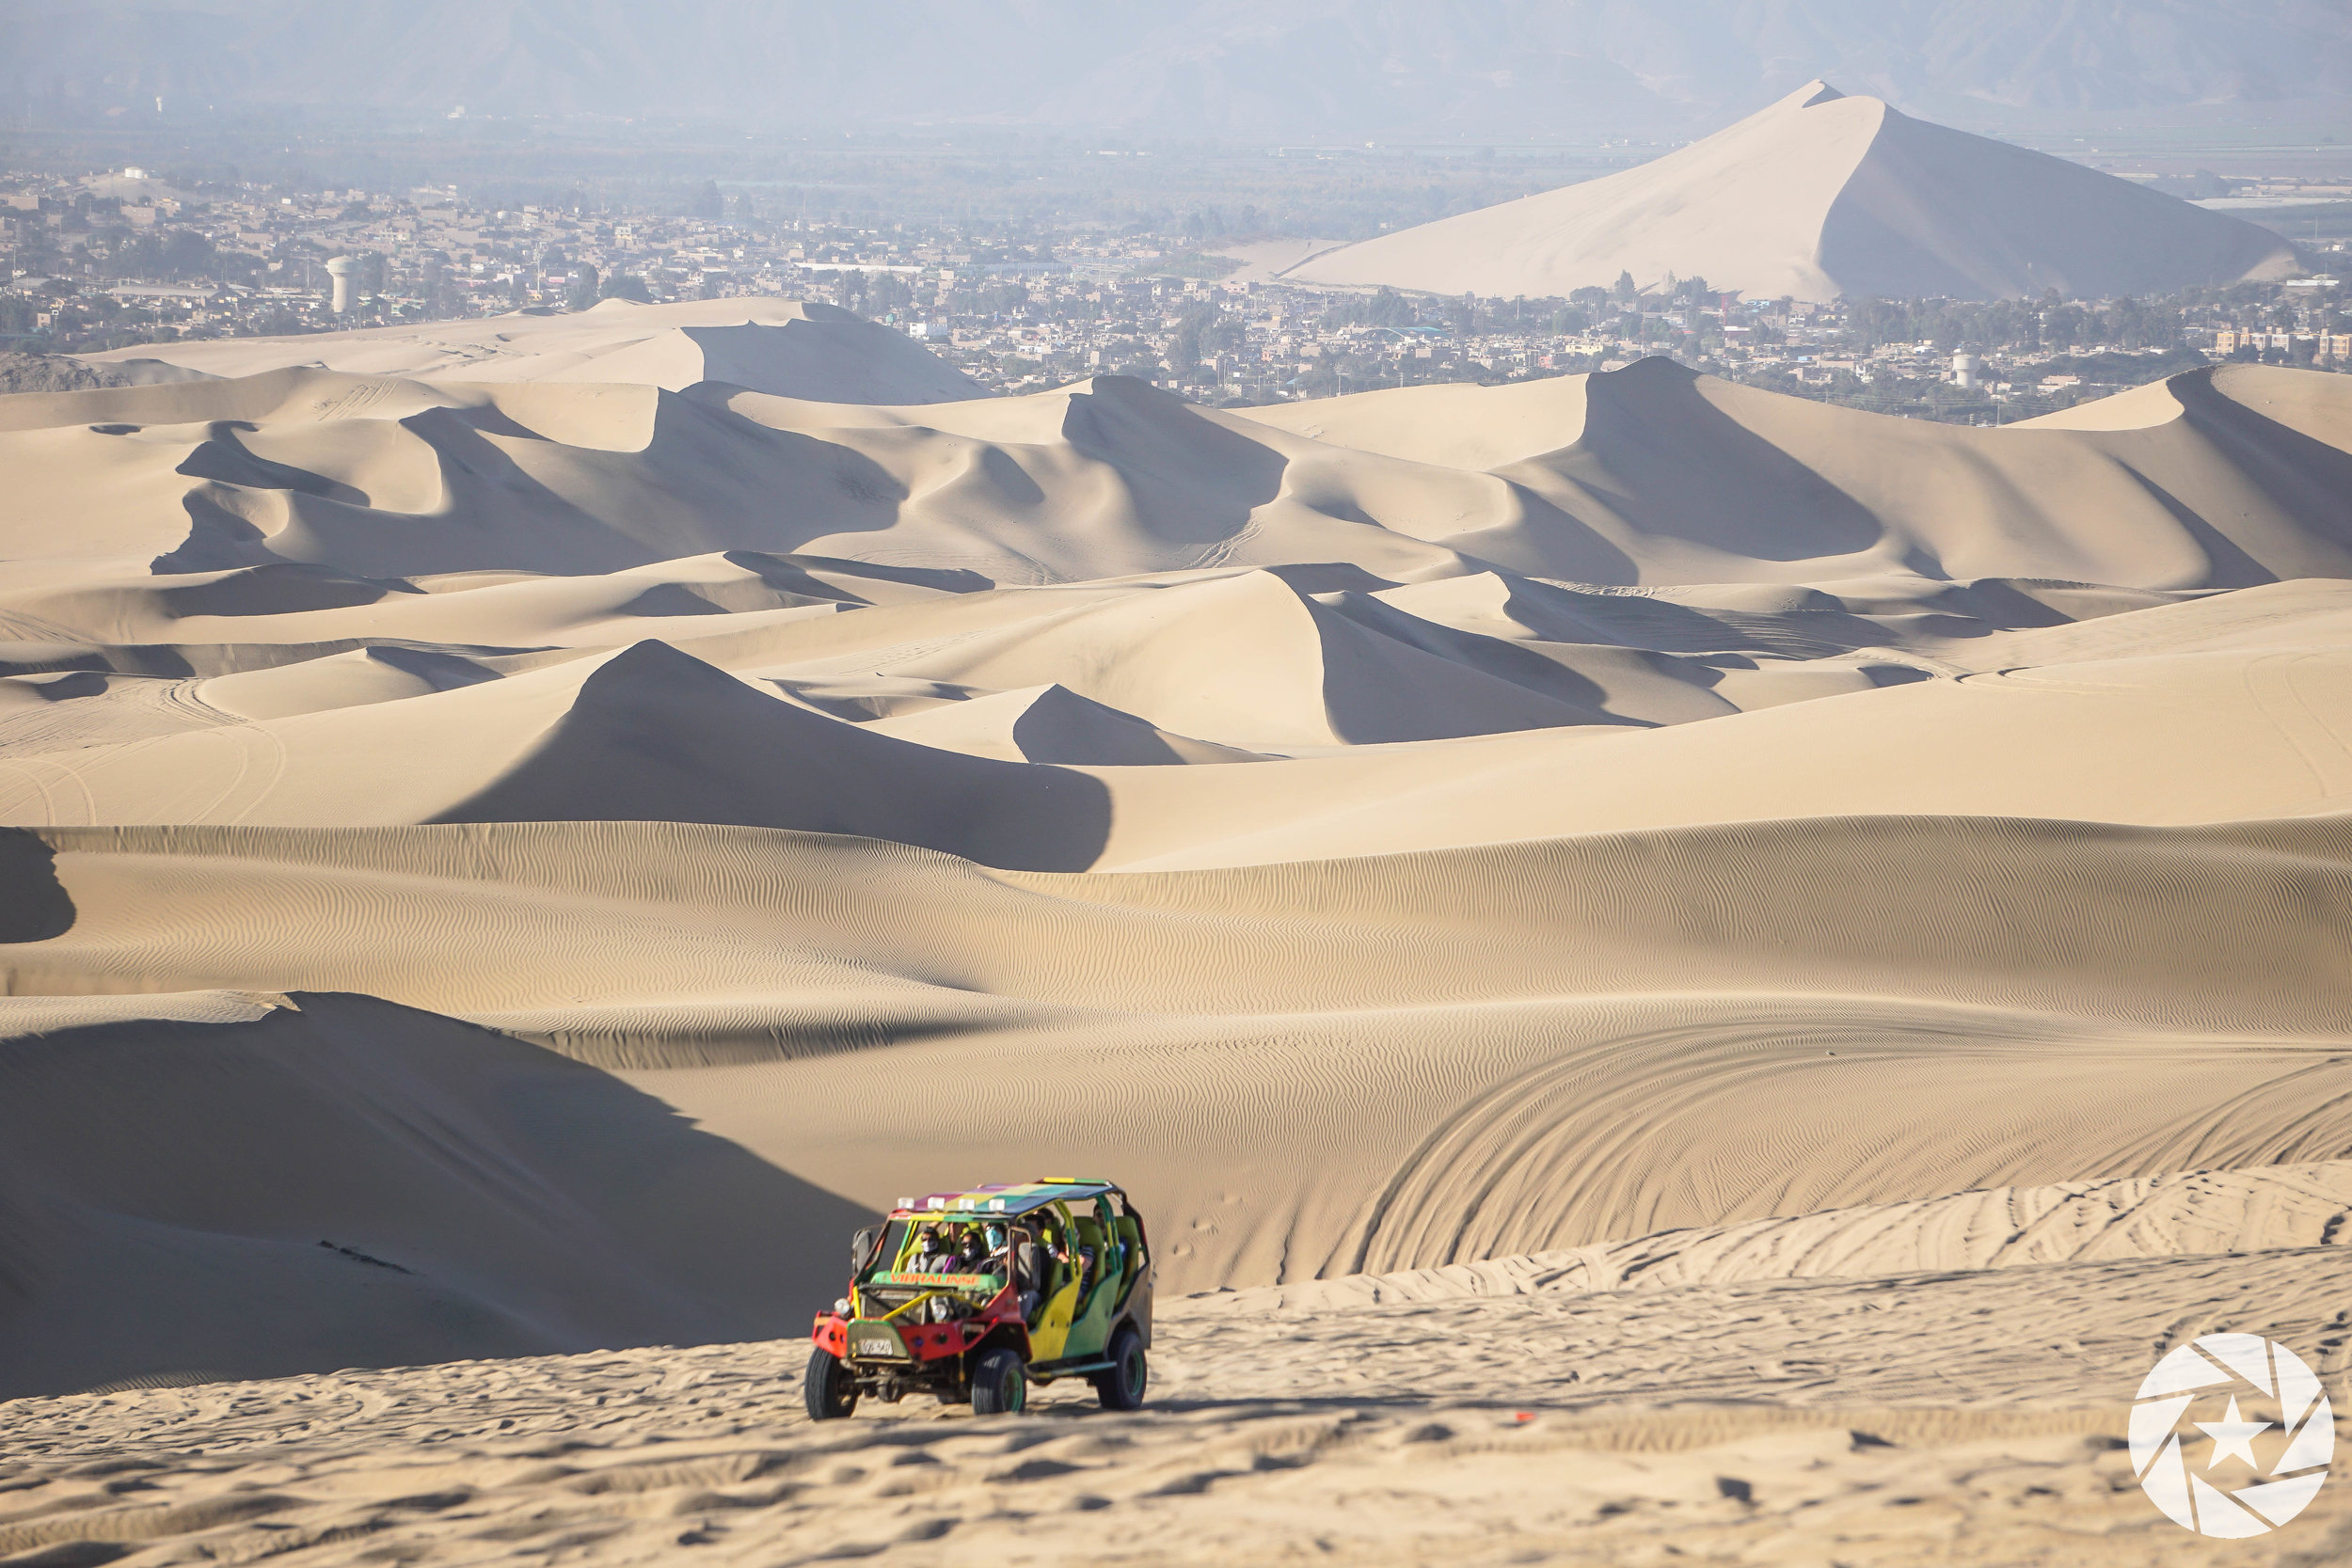 Dune buggy adventures in Huacachina, Peru